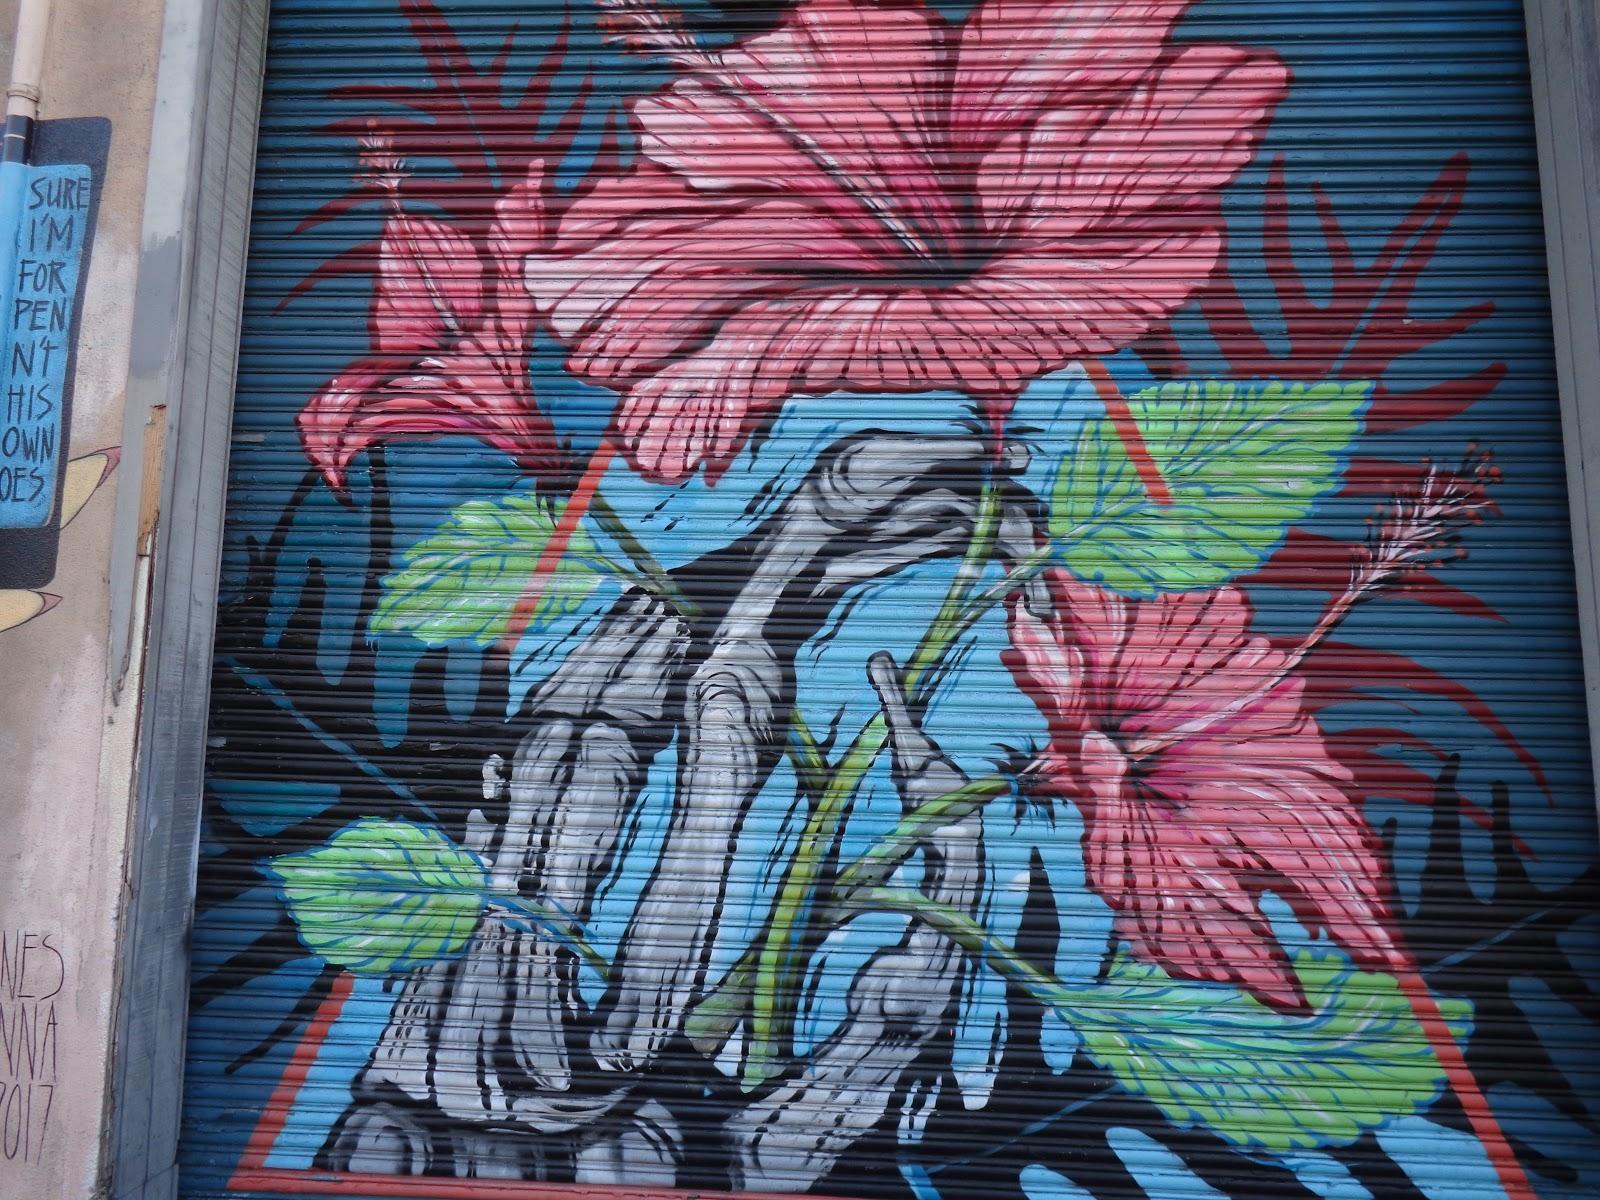 Ed abillano todays street art hibiscus flower todays street art hibiscus flower izmirmasajfo